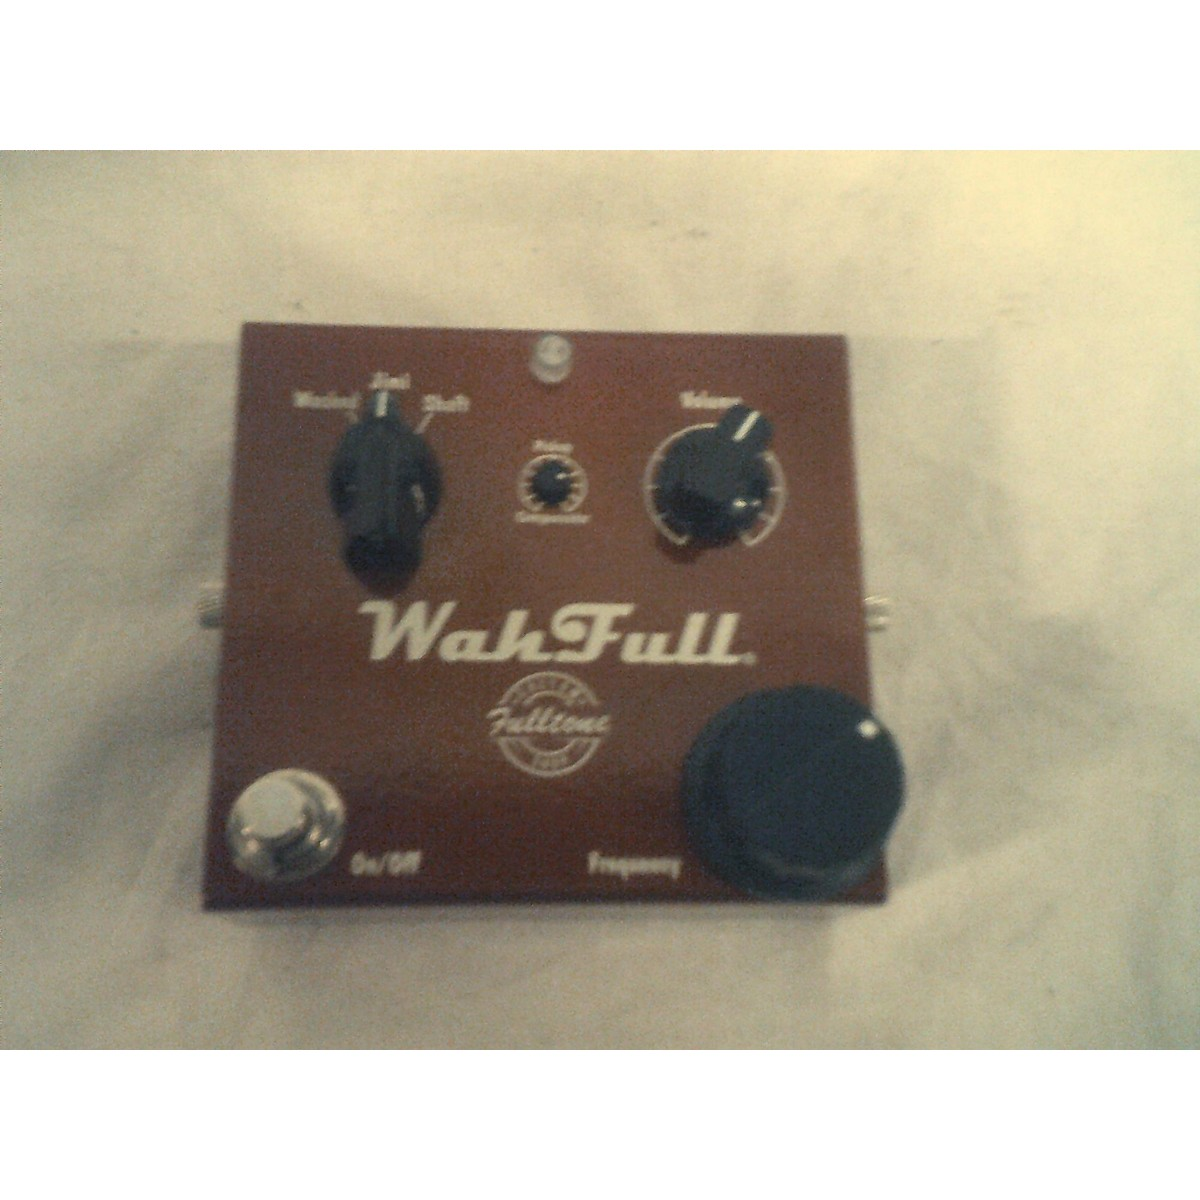 Fulltone WahFull Effect Pedal